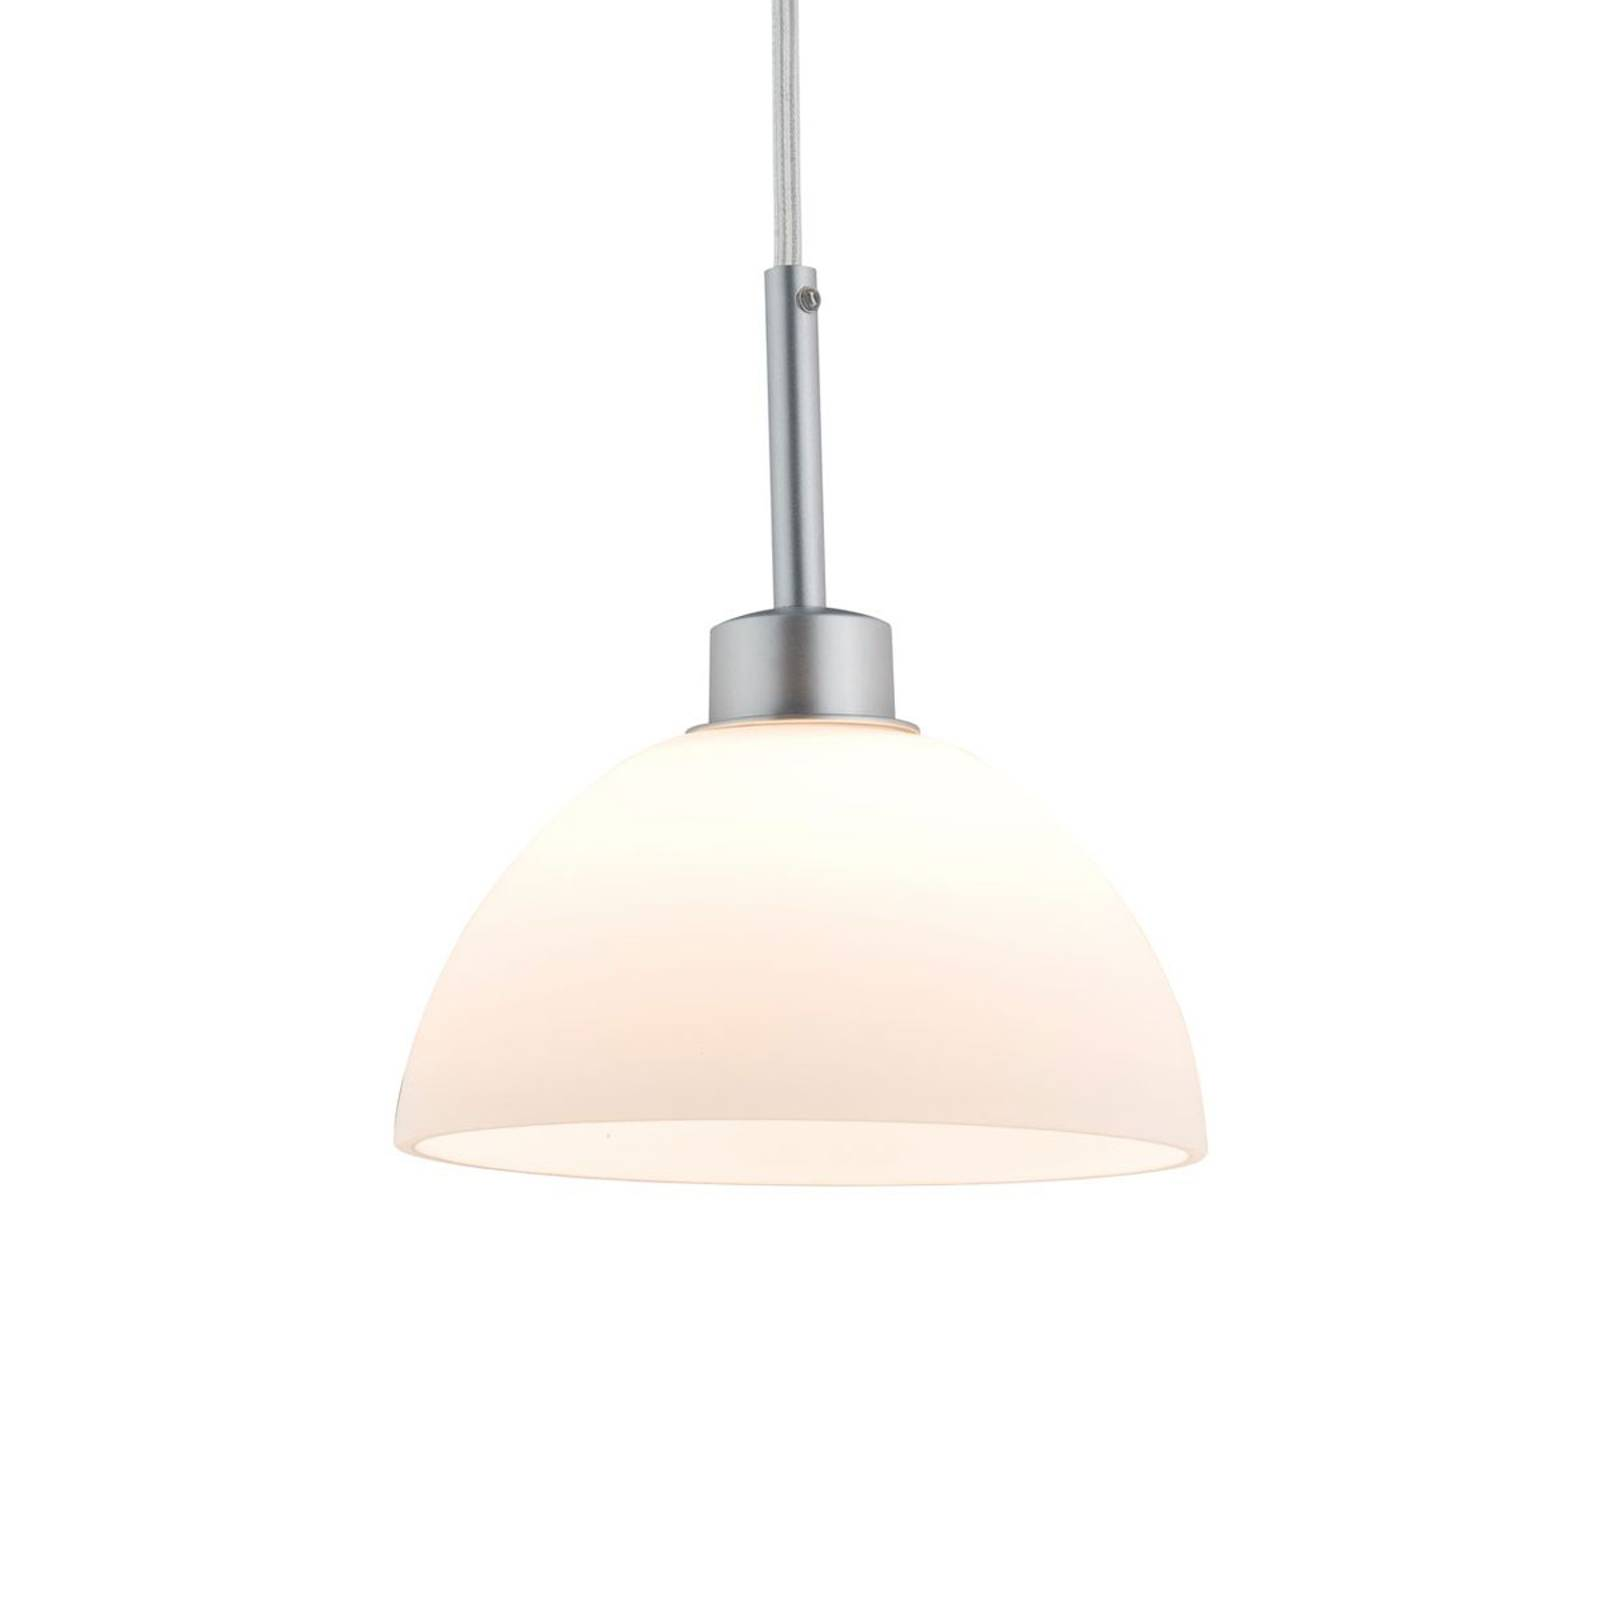 Paulmann URail Sarrasani glashanglamp, chroom mat